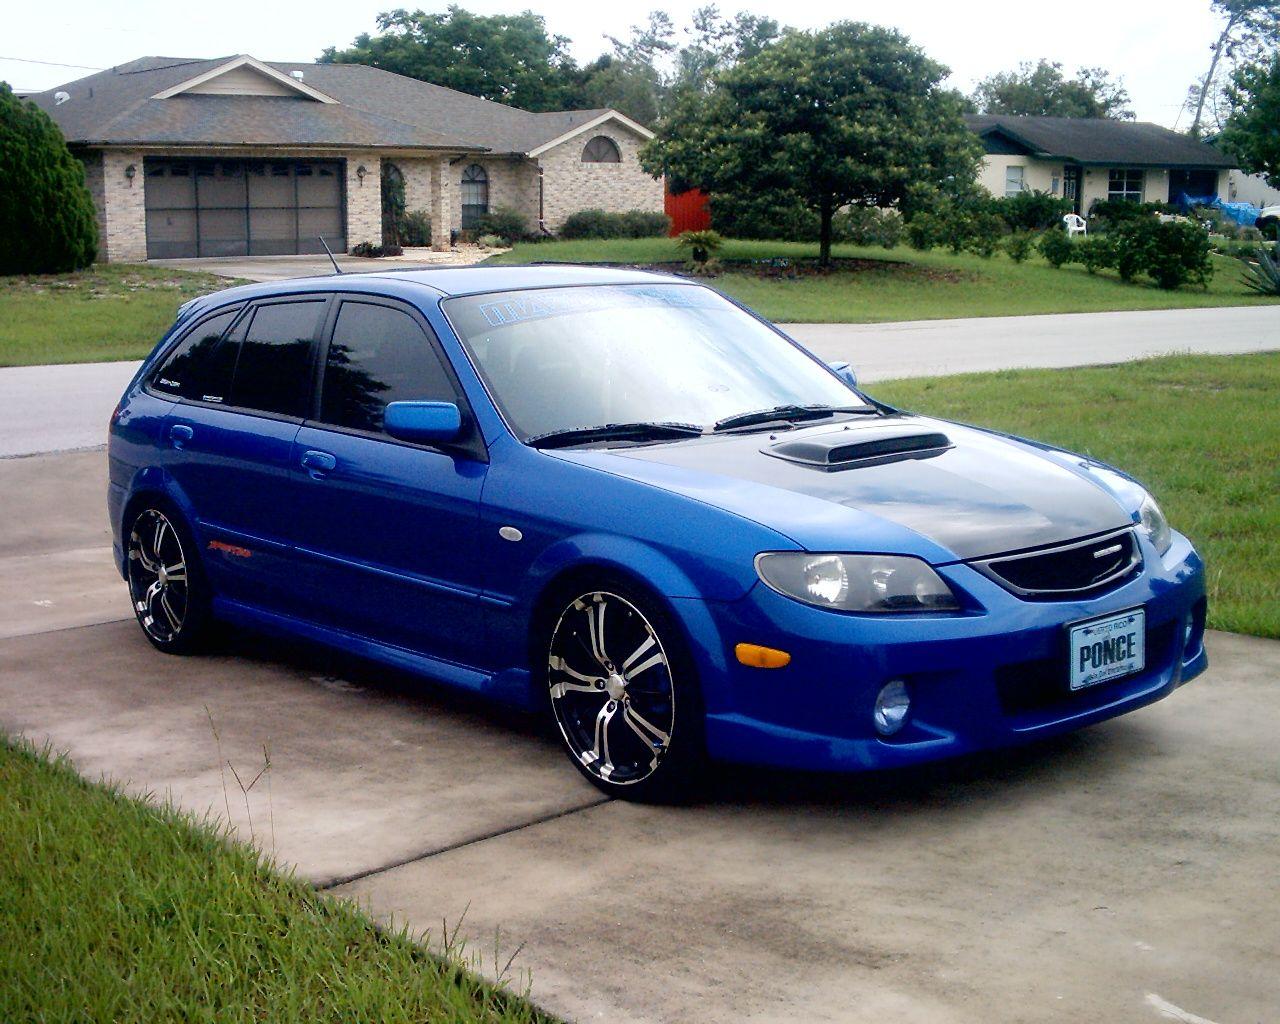 Kelebihan Kekurangan Mazda 2003 Review